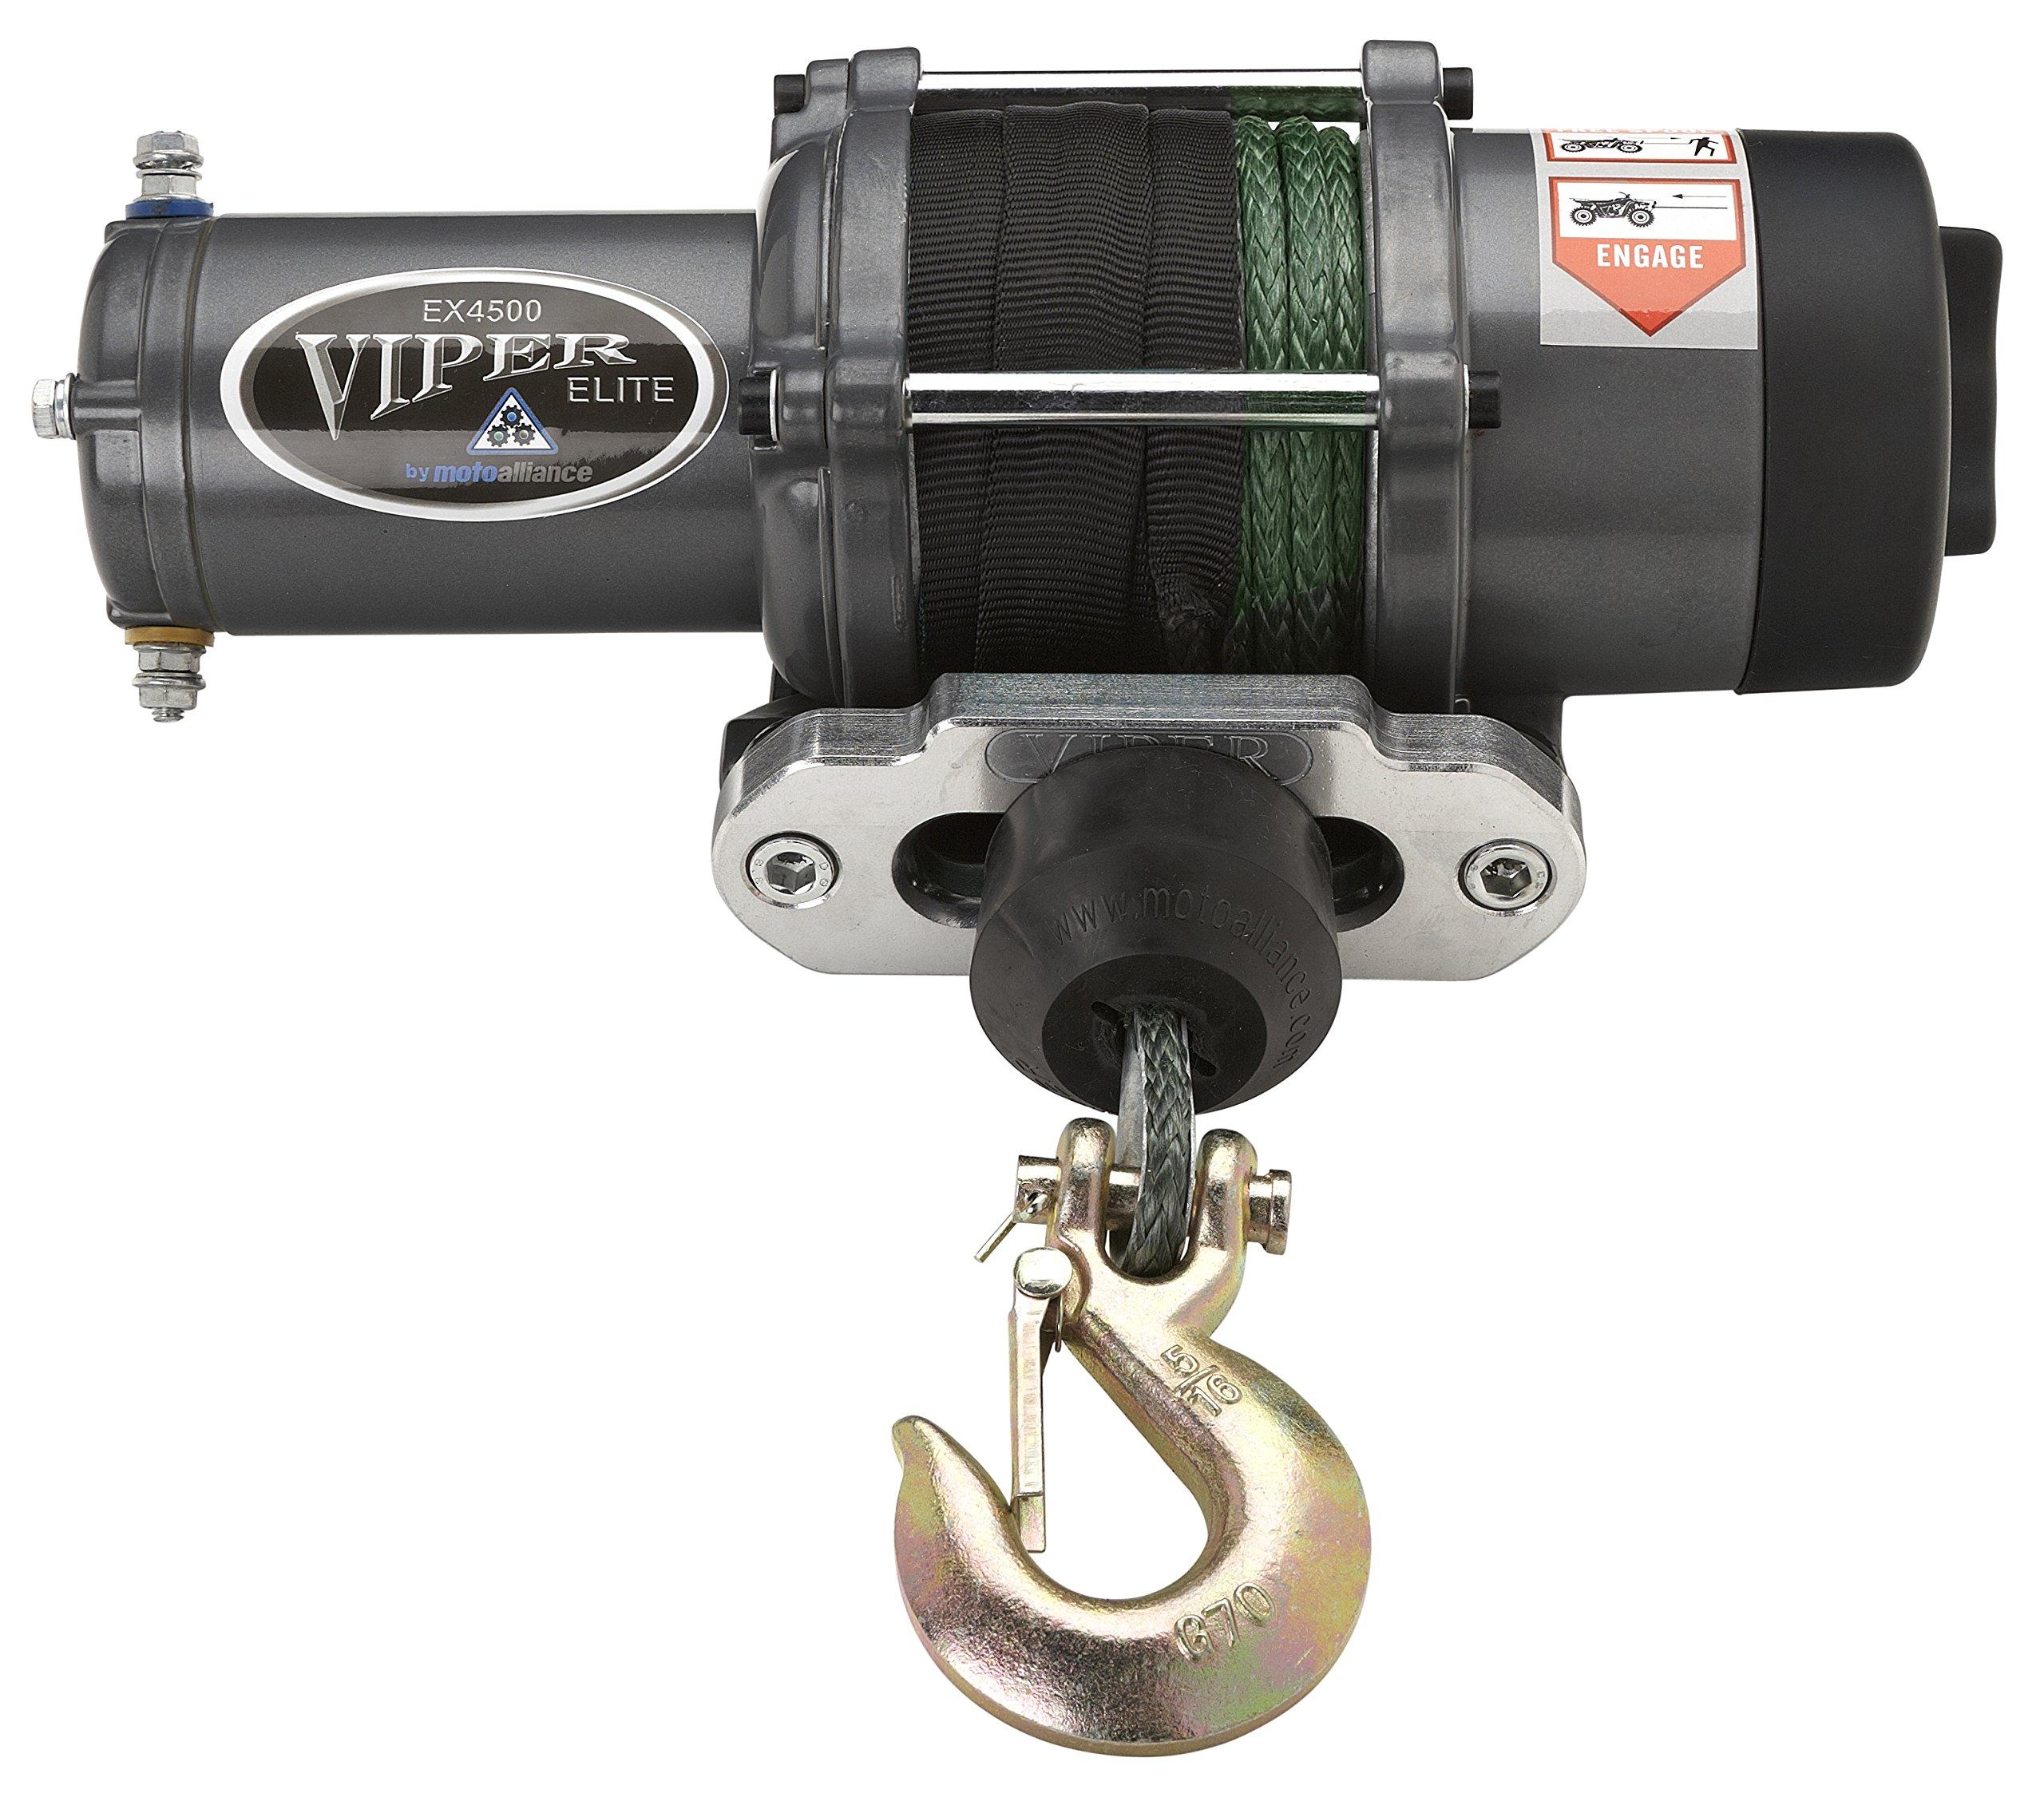 VIPER Elite 4500lb ATV/UTV Winch with 40 feet GREEN AmSteel-Blue Synthetic Rope